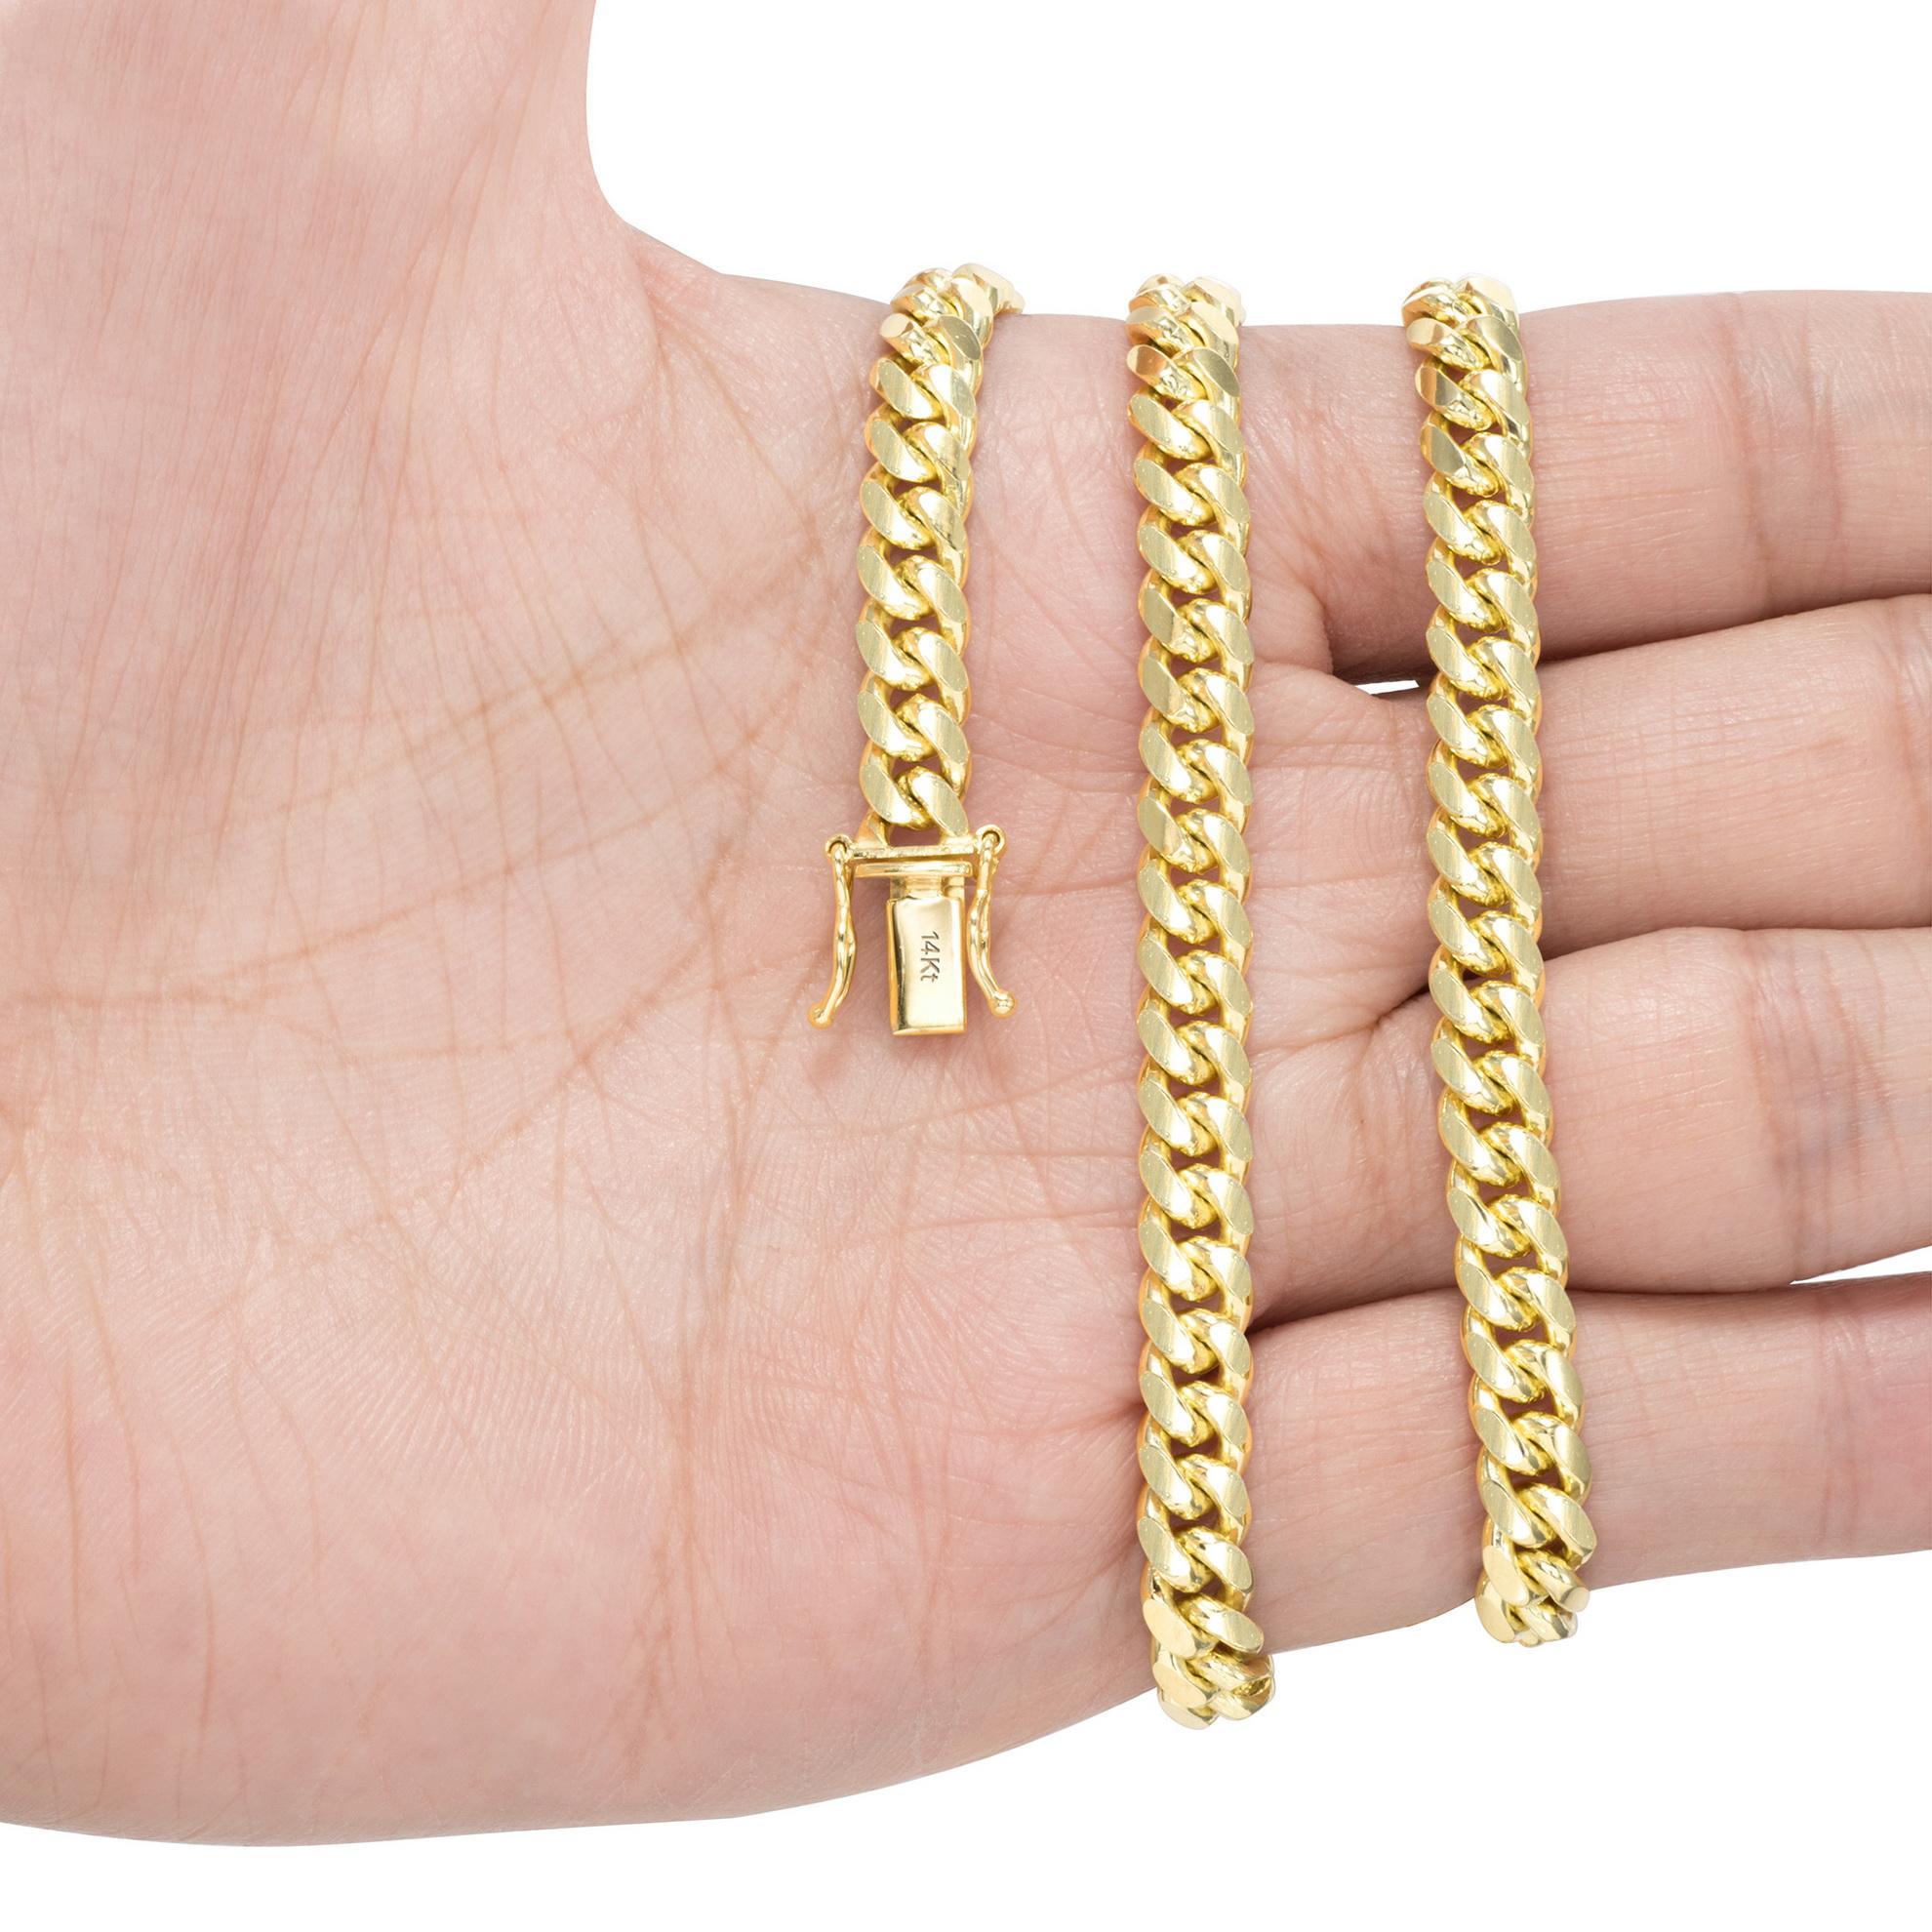 14K-Yellow-Gold-Solid-2-7mm-11mm-Miami-Cuban-Link-Chain-Bracelet-Men-Women-7-034-9-034 thumbnail 21